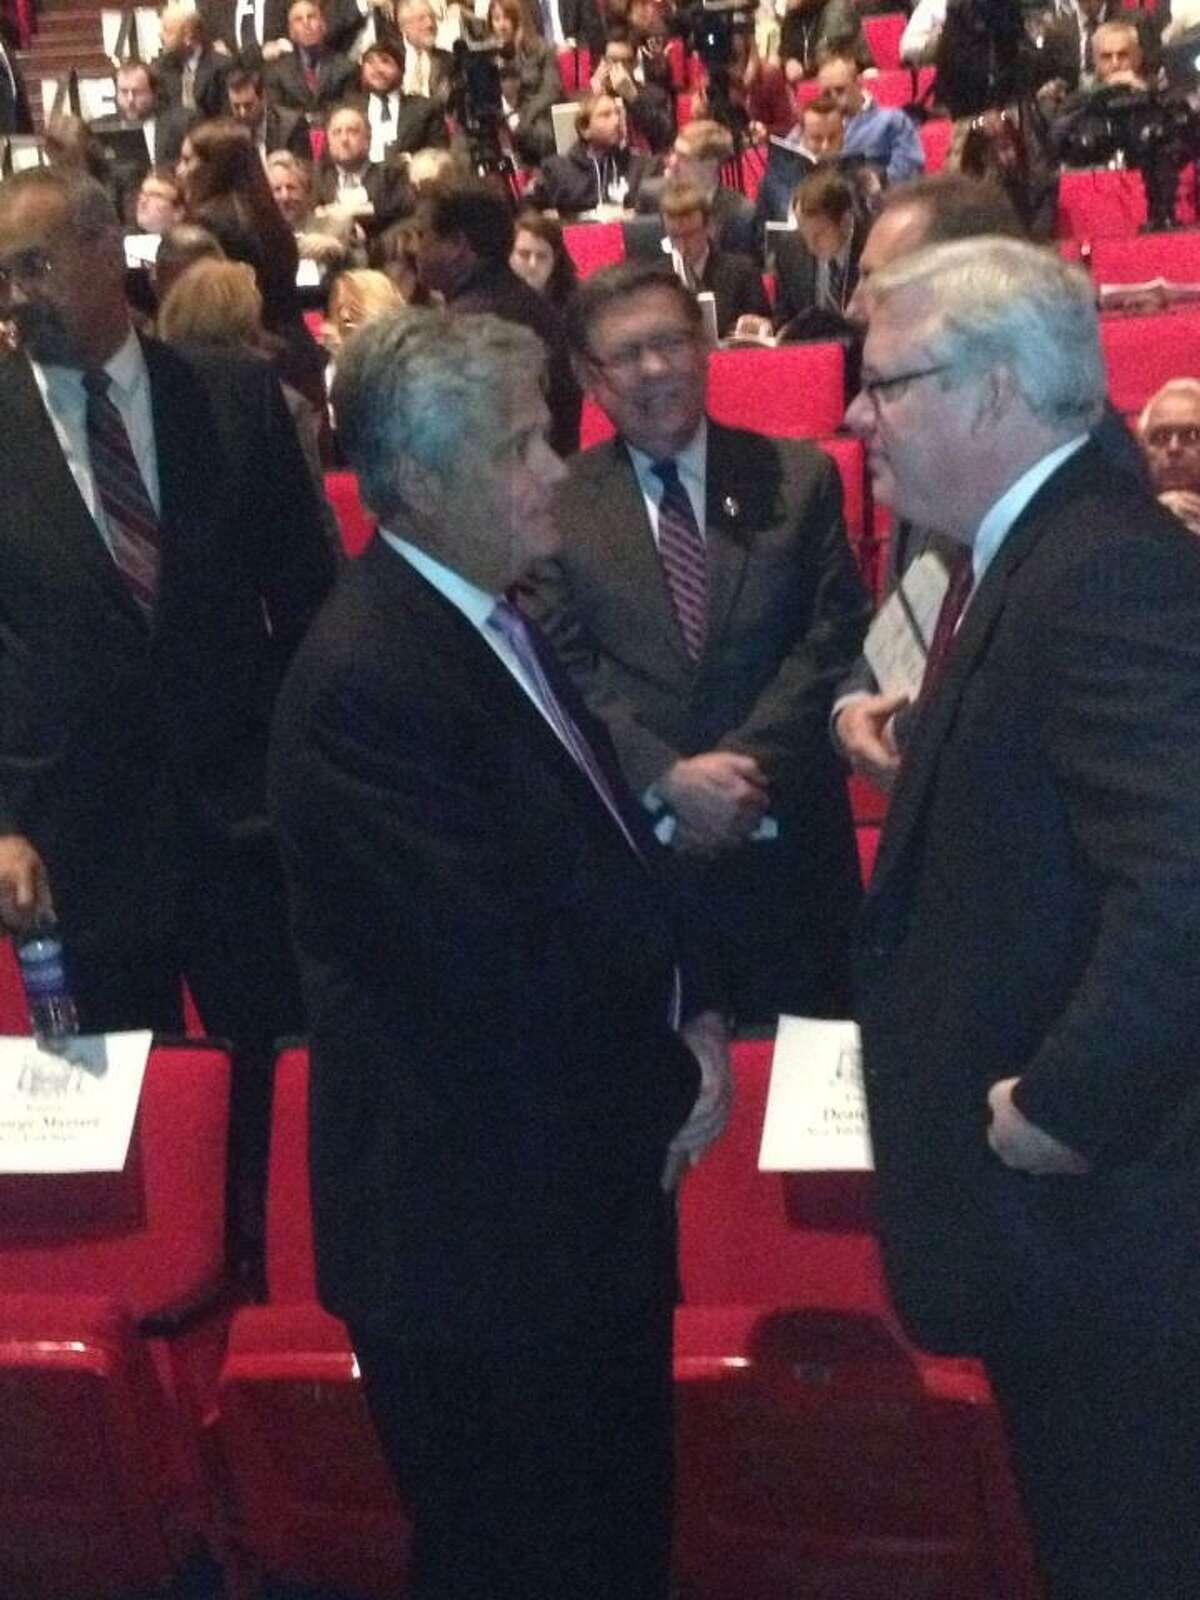 Senate Co-President Dean Skelos arrives for Gov. Andrew Cuomo's budget address. (Bryan Fitzgerald / Times Union)